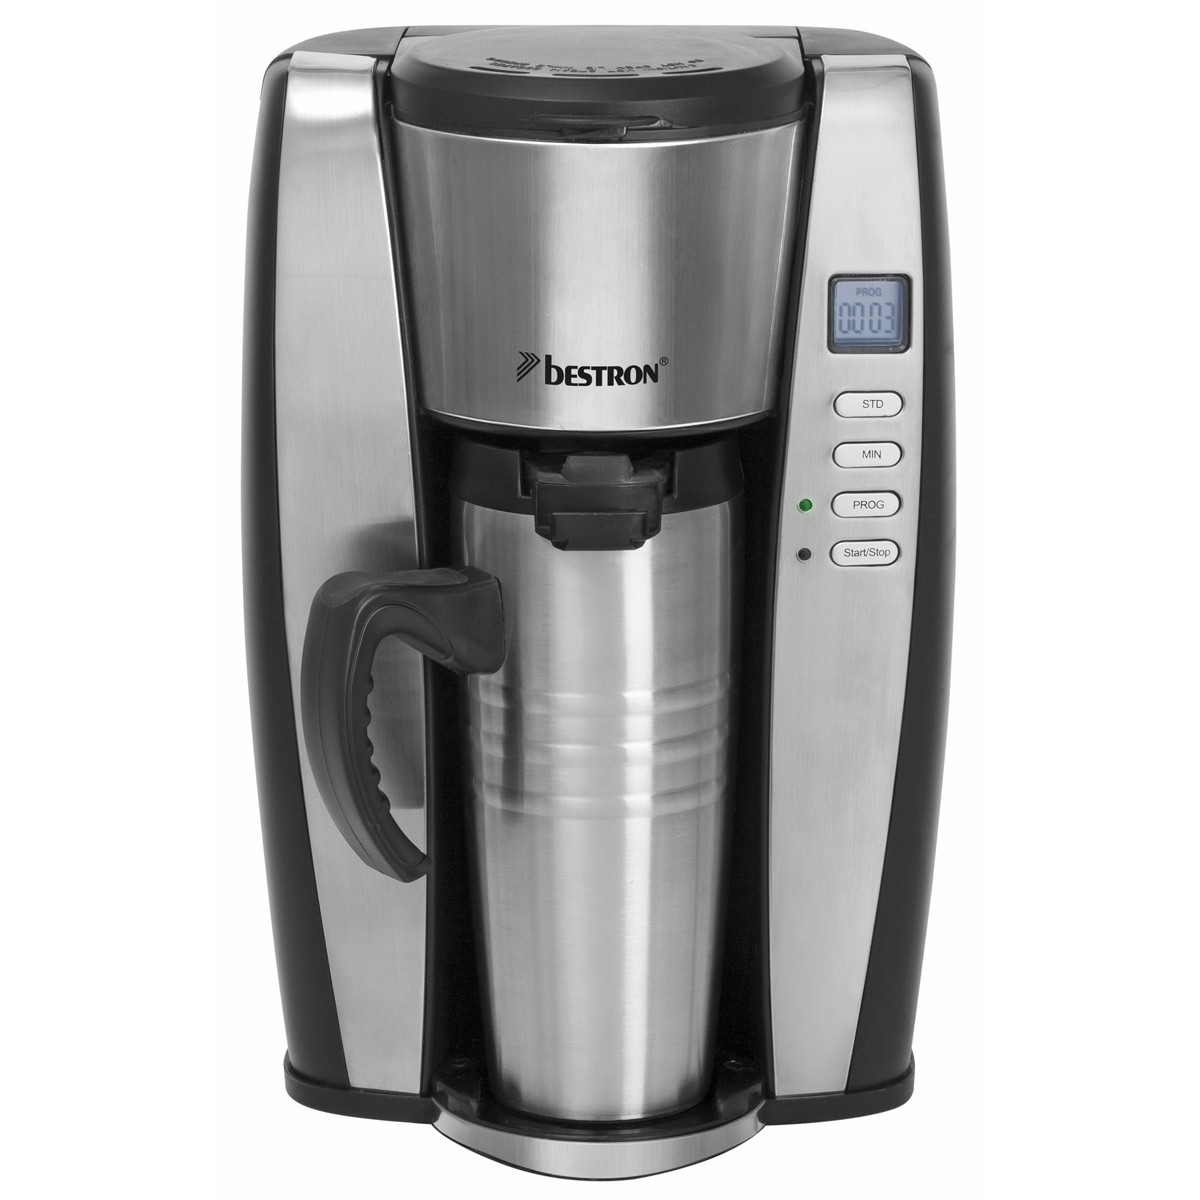 Bestron koffiefilter apparaat ACUP650